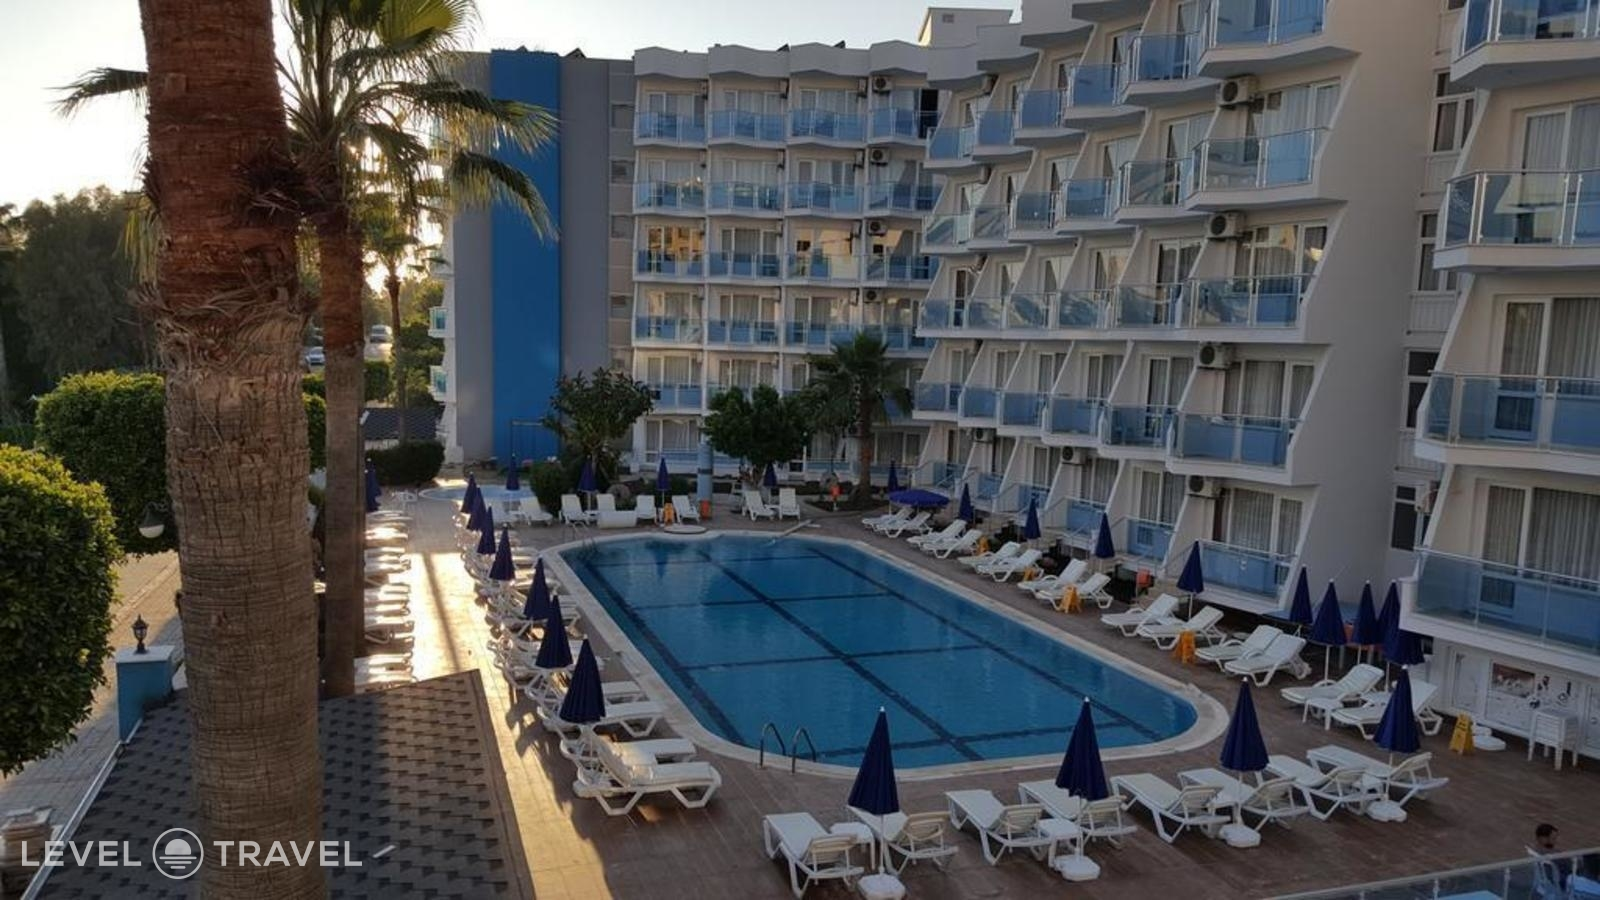 VIVA ULASLAR HOTEL